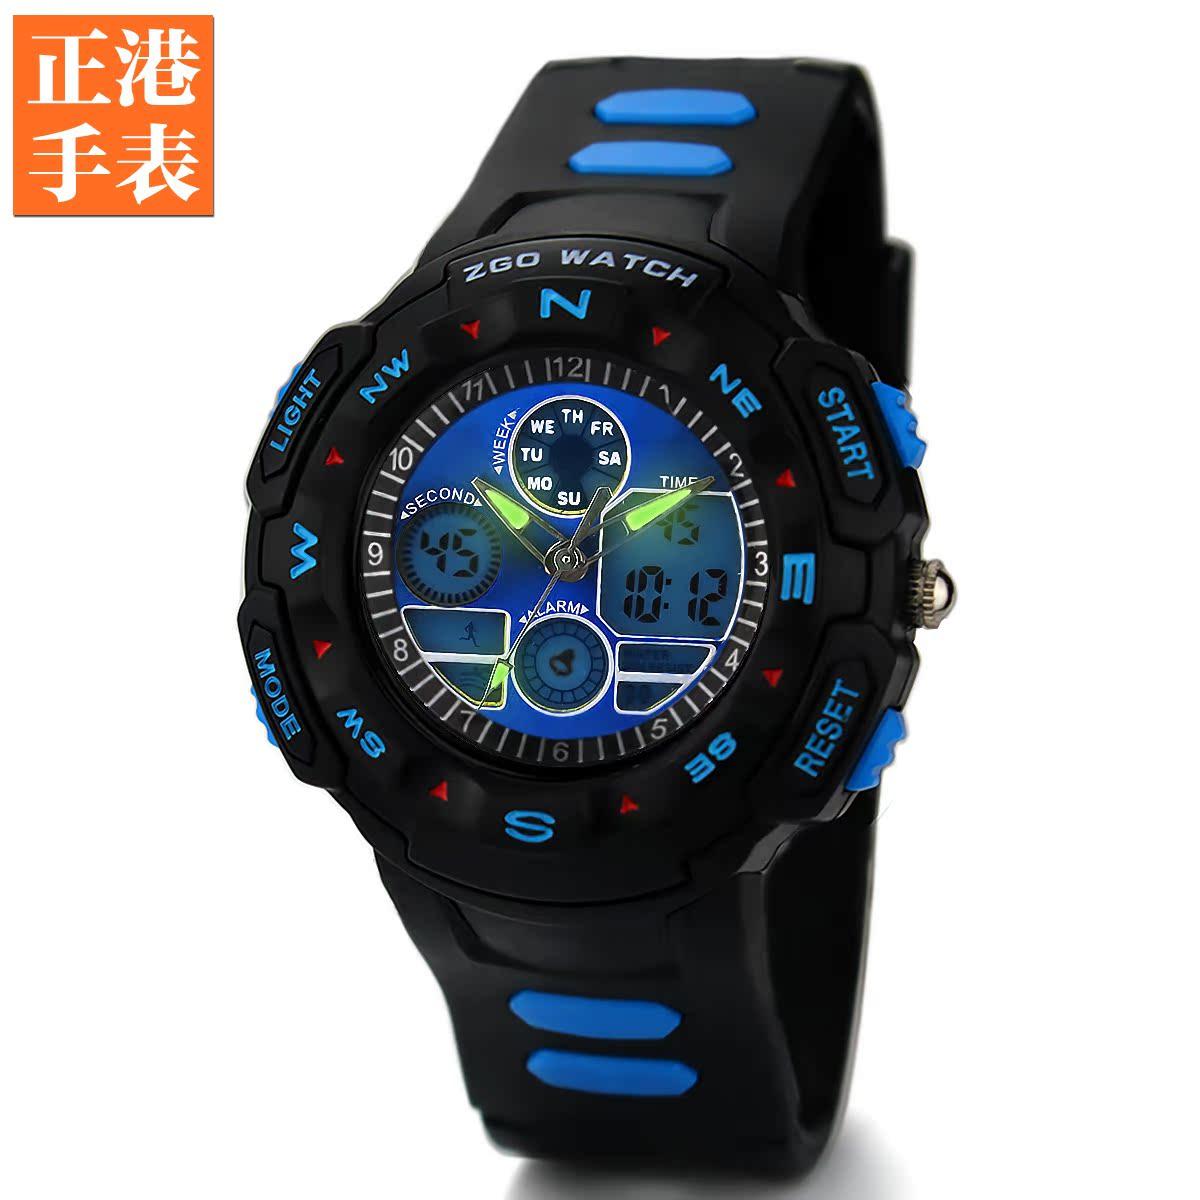 ZGO学生电子表 韩国儿童手表 男孩潮流多功能户外运动LED双显男表